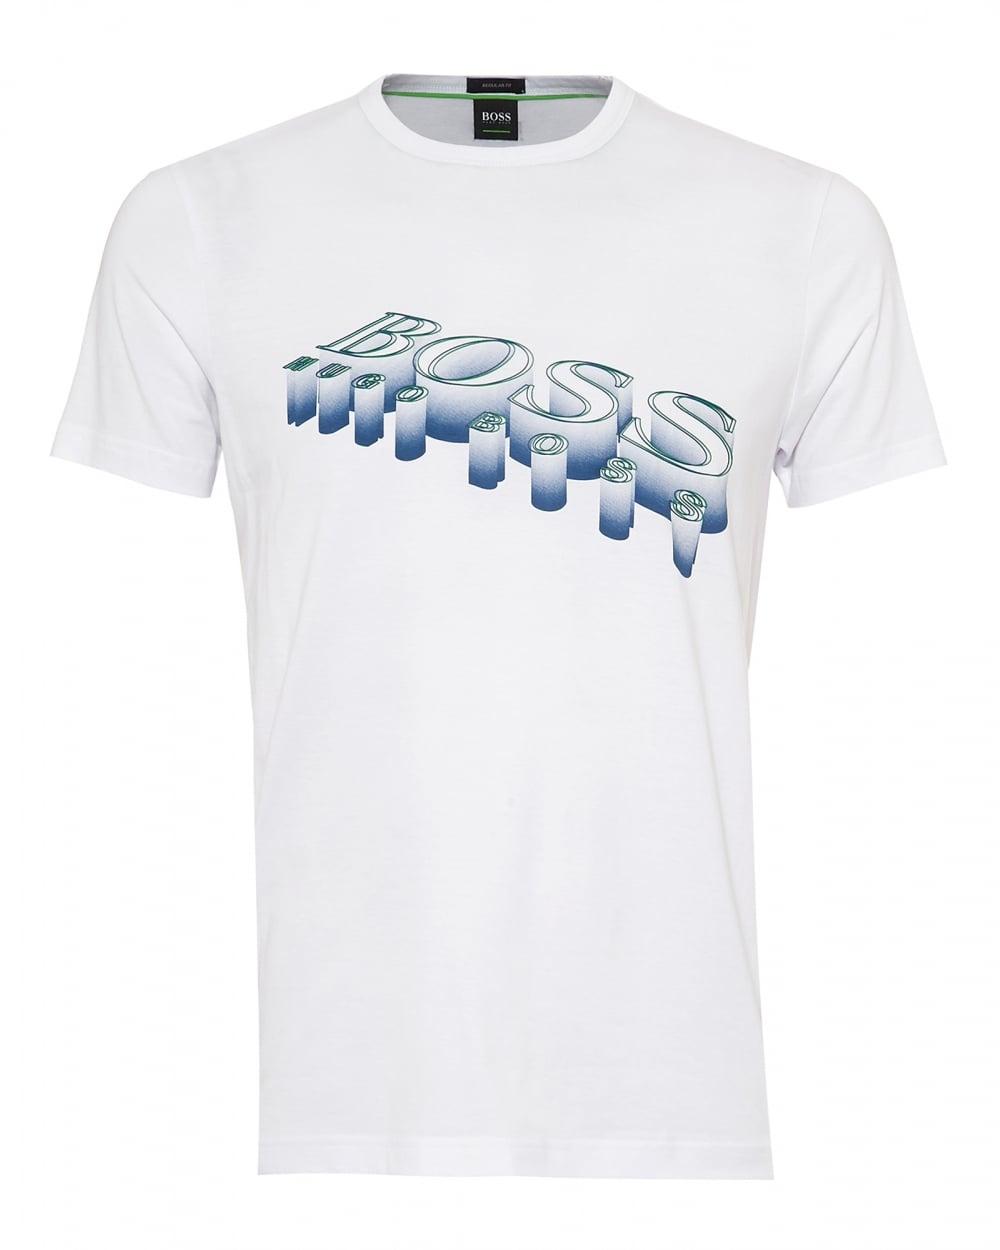 e9d58a015f Hugo Boss Green Mens Tee 2 T-Shirt, 3D Logo Graphic White Tee